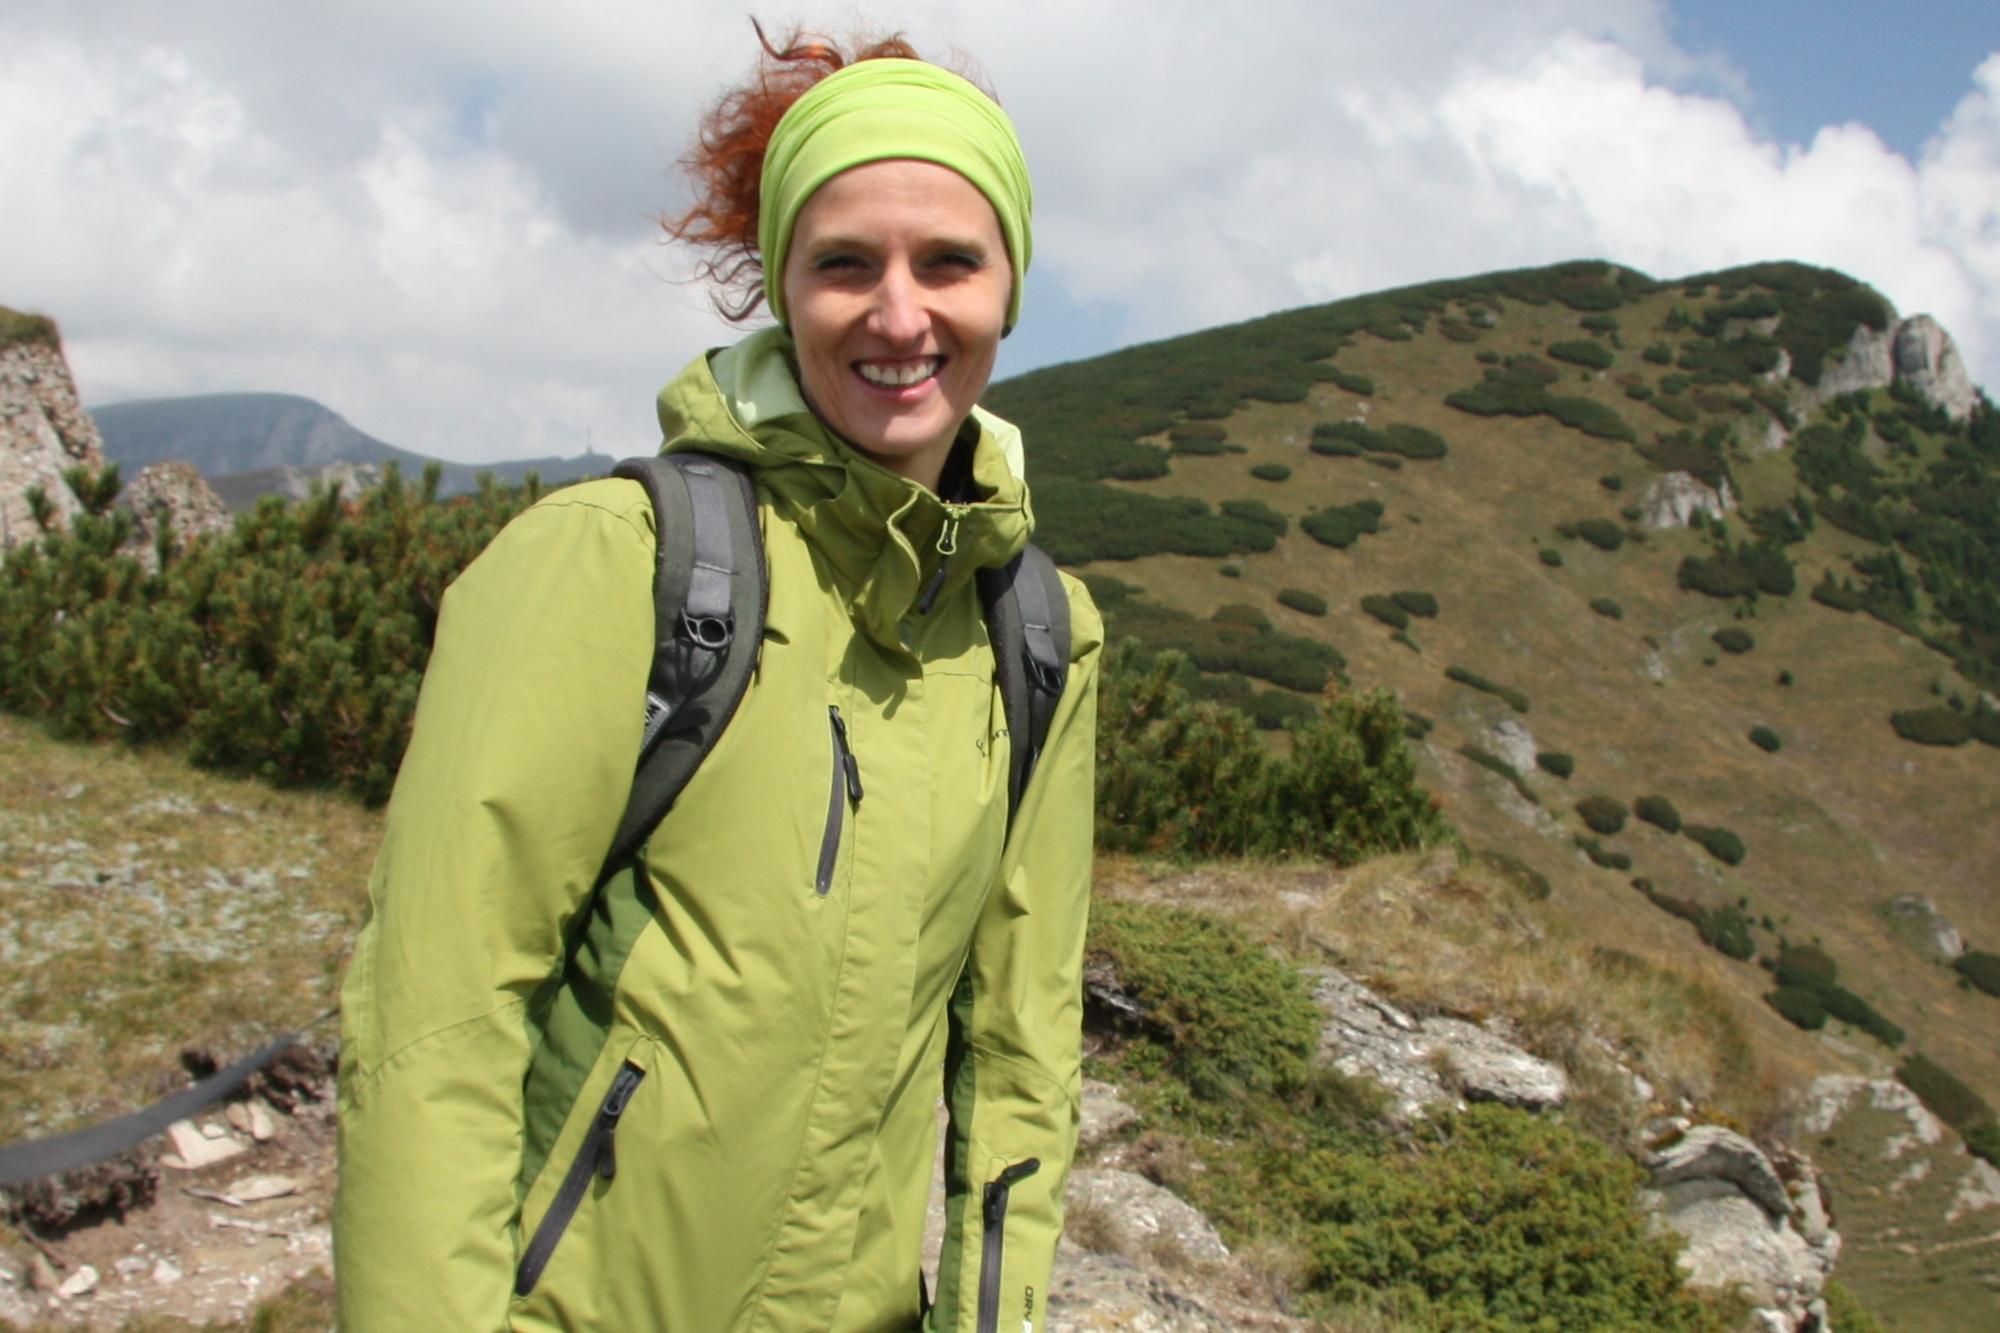 Agata Lechowicz